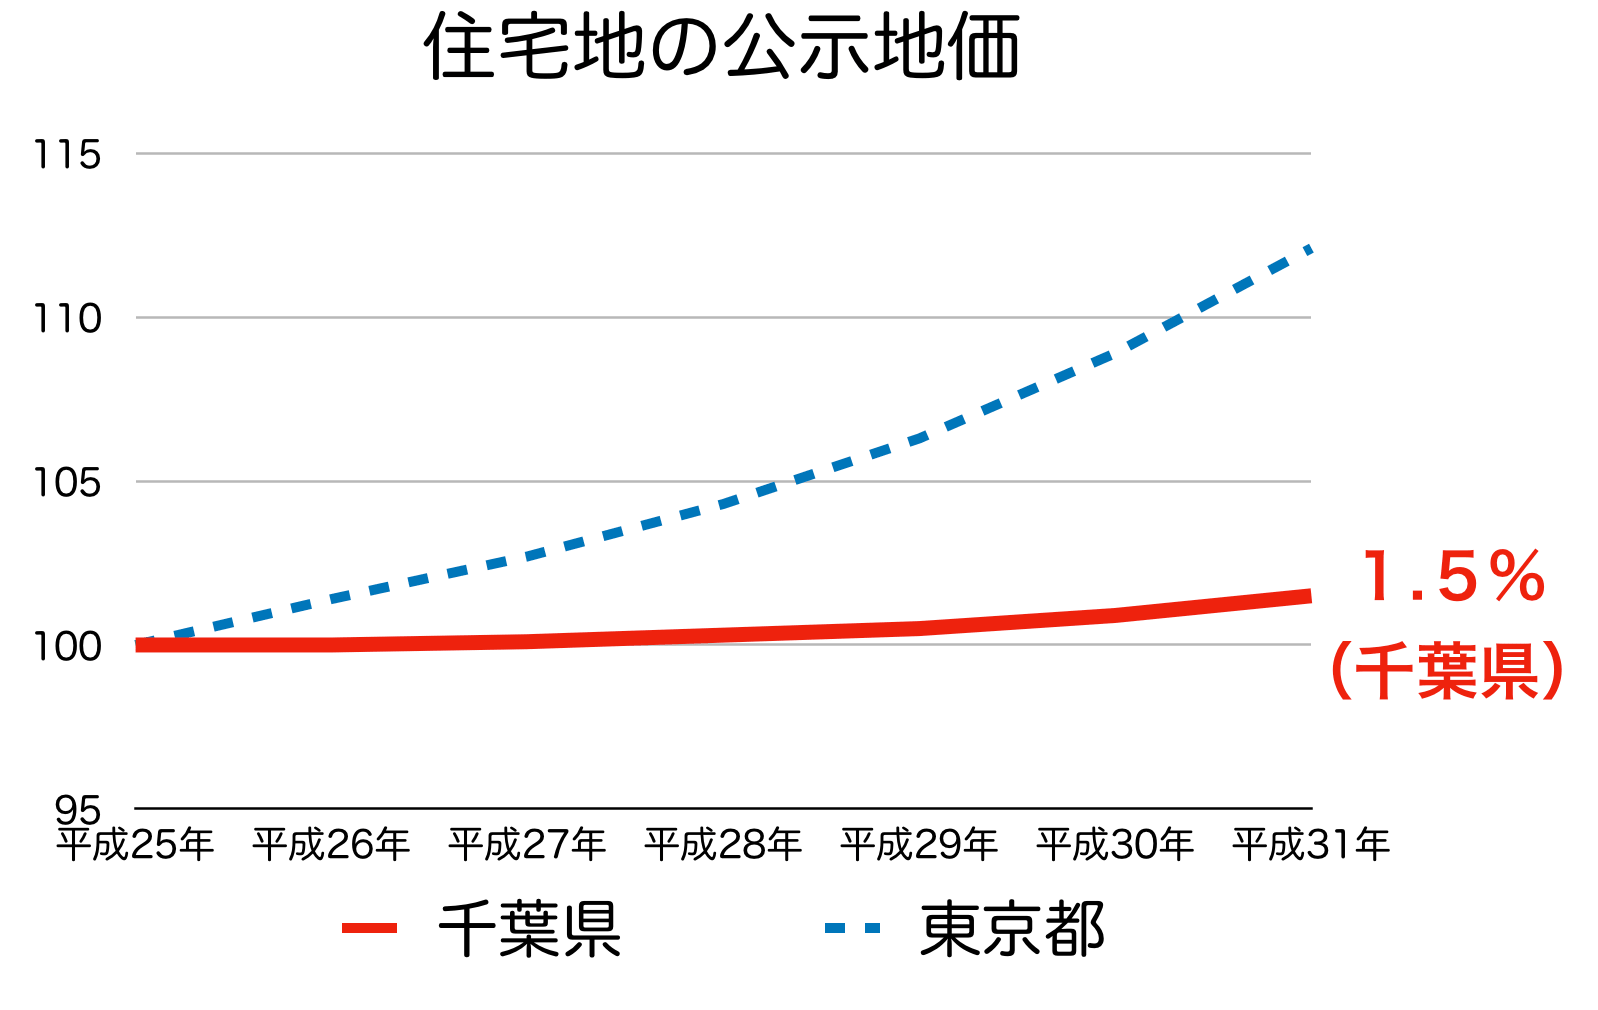 千葉県の公示地価の変化率 H25-H31